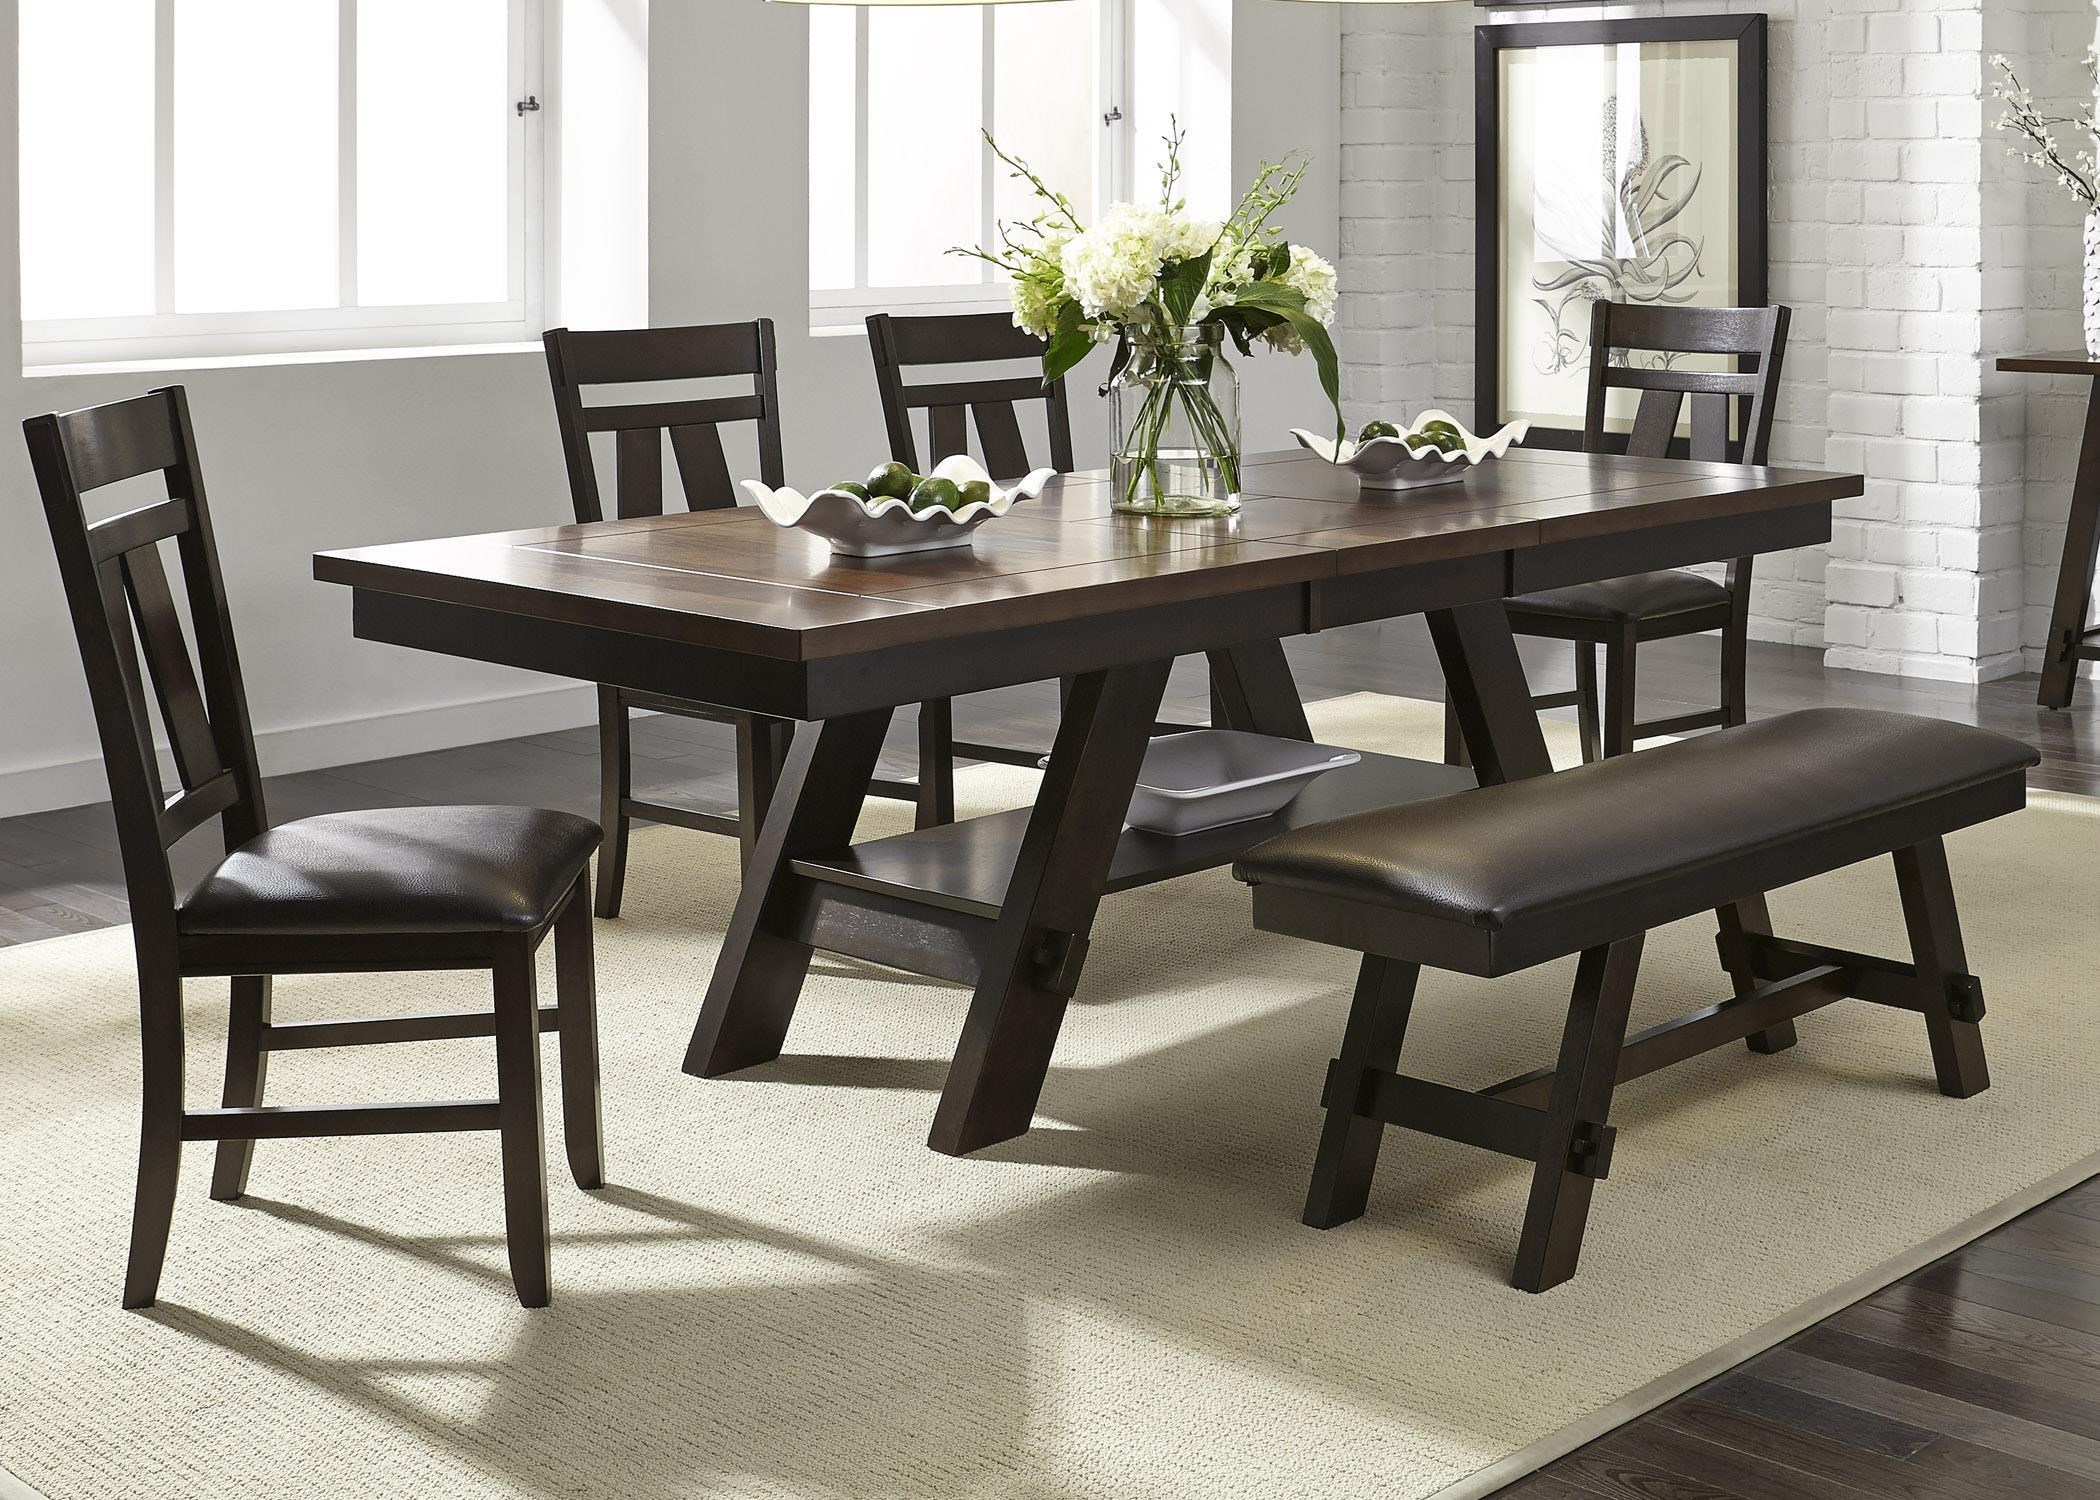 Ordinaire Darvin Furniture